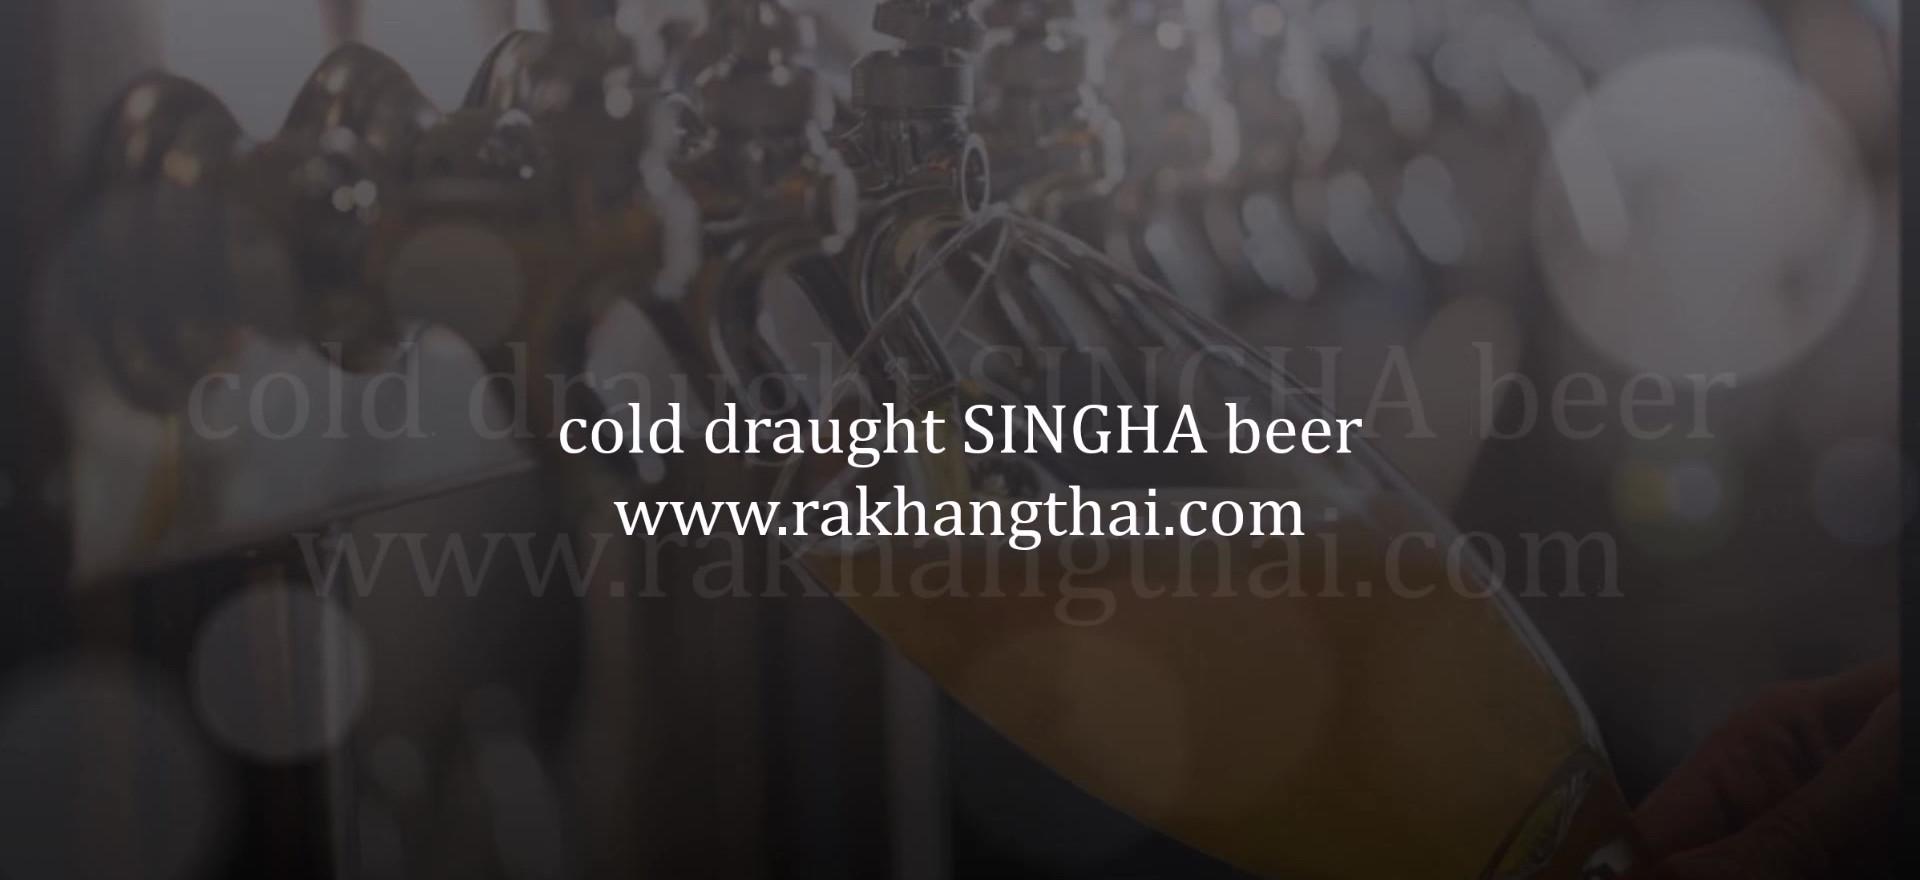 Rakhang Thai Singha Draught Beer Promotion